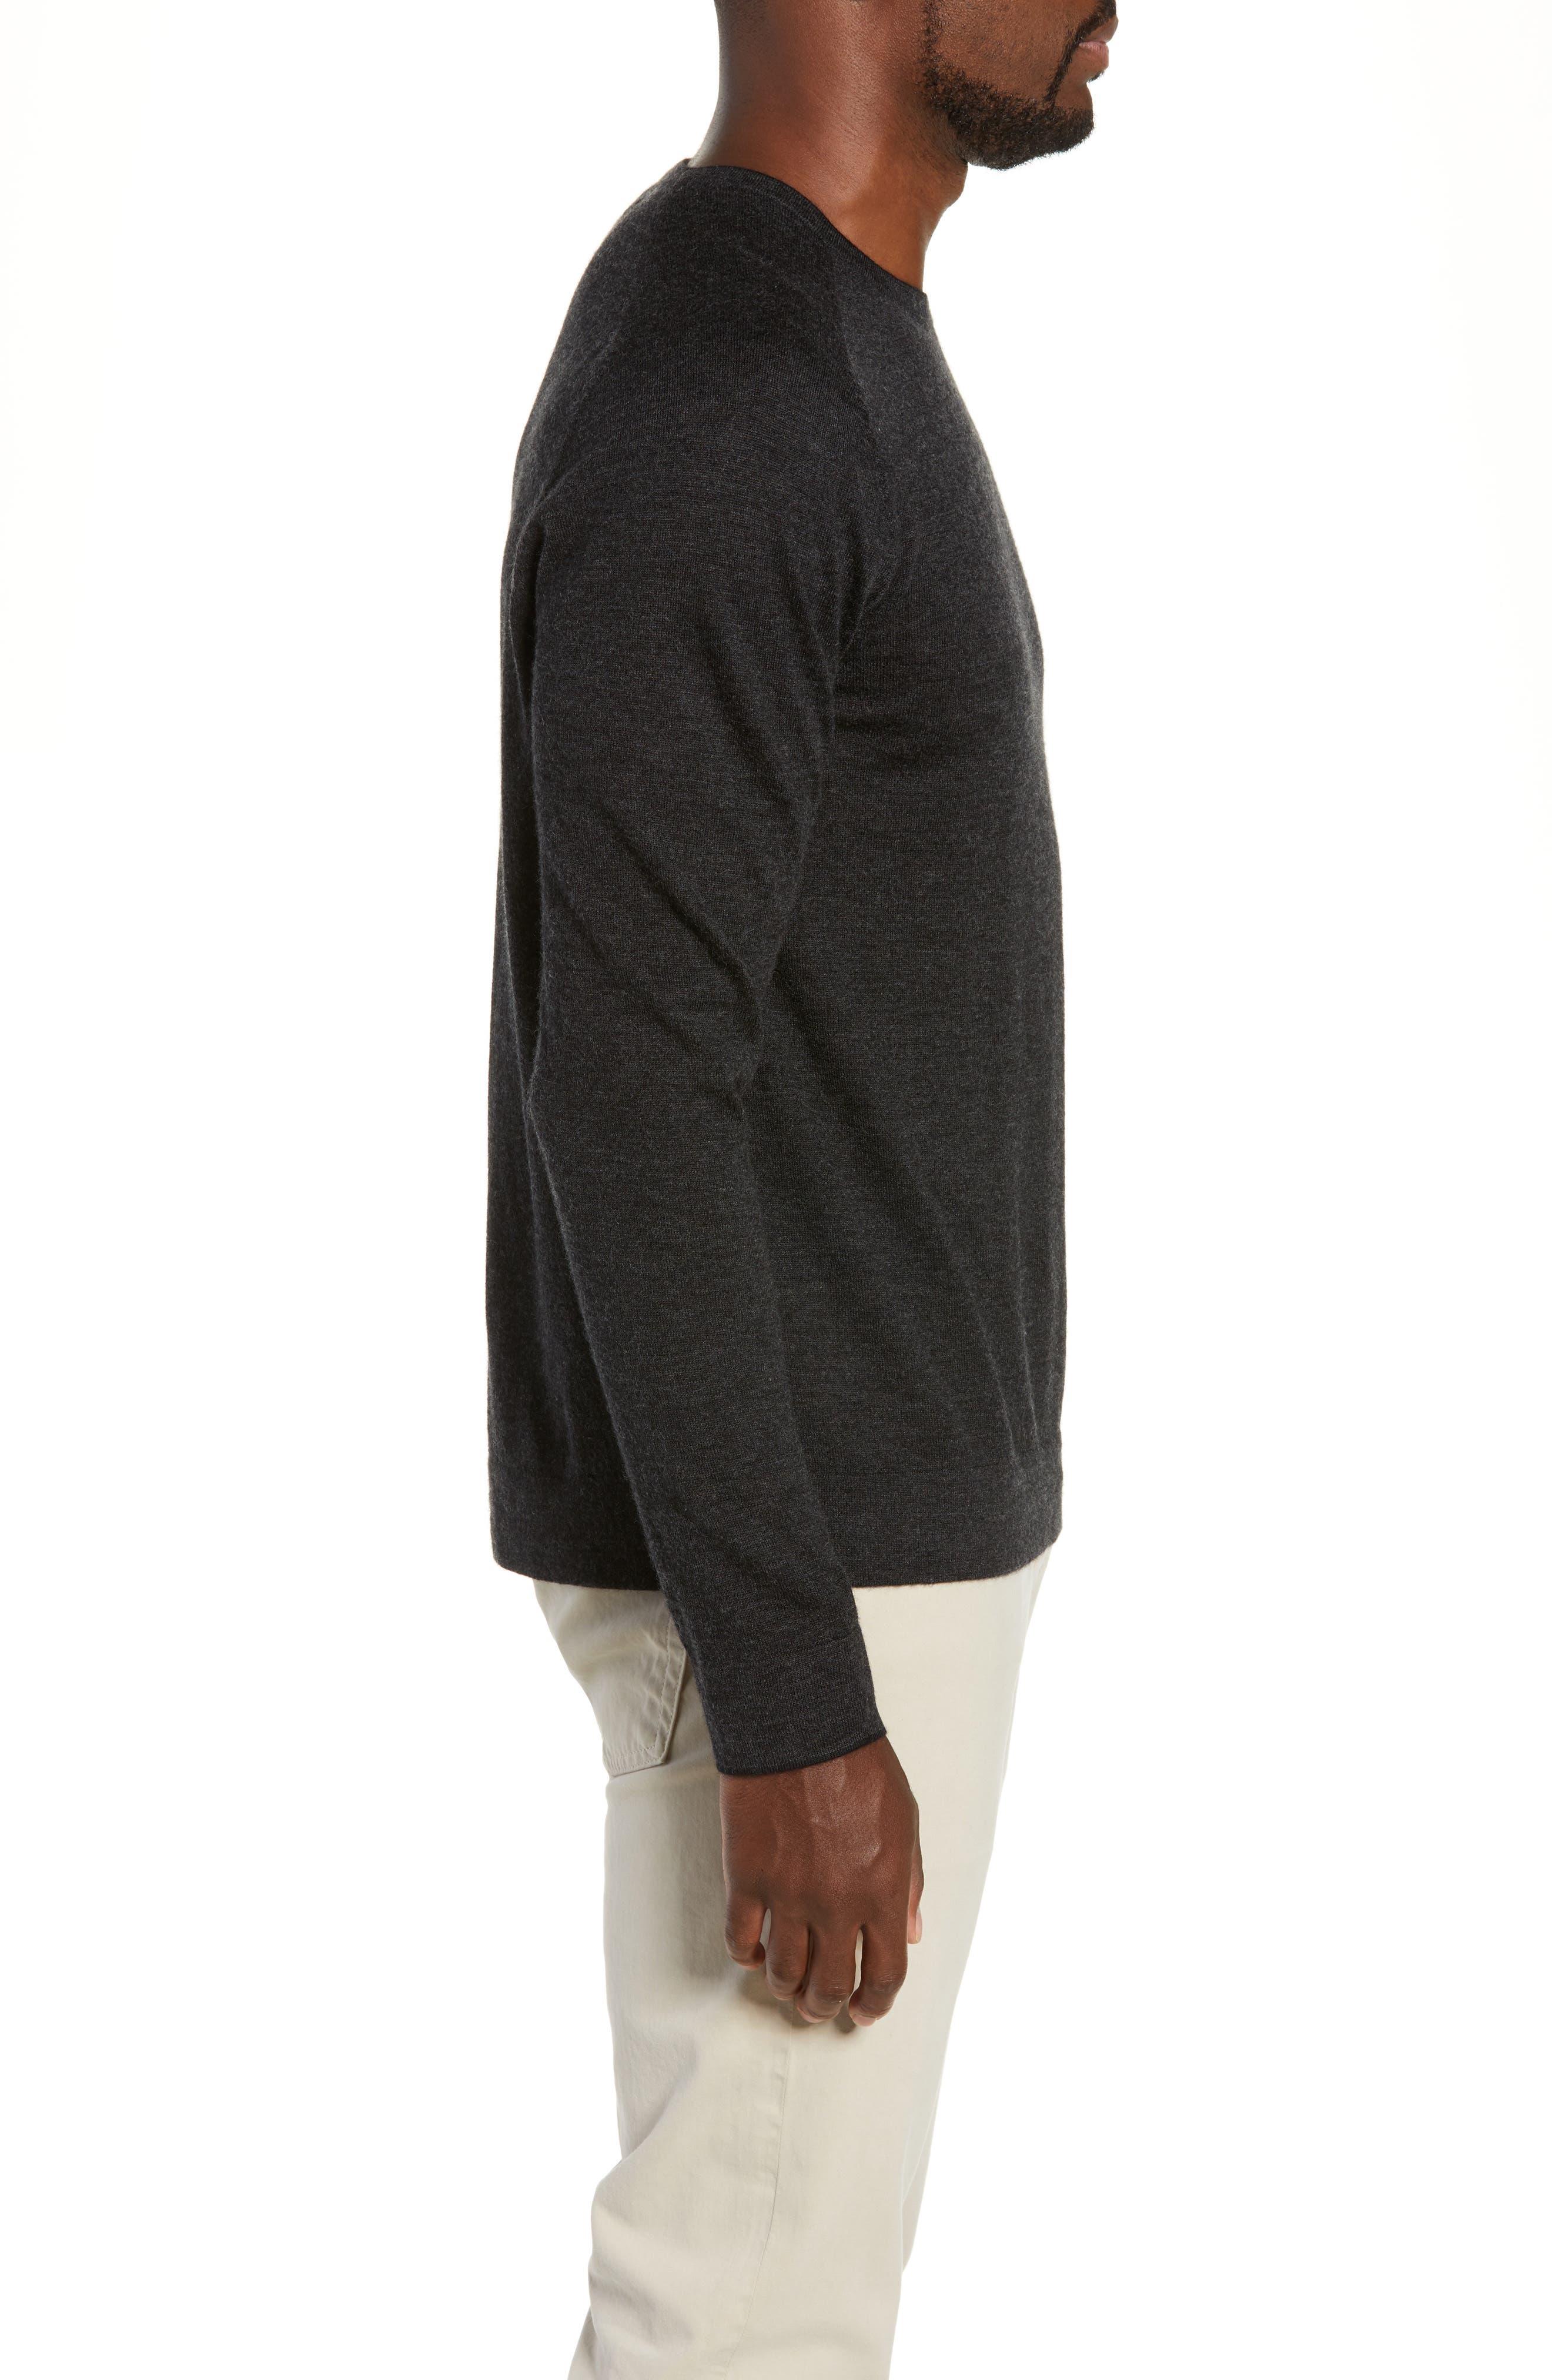 NORDSTROM SIGNATURE,                             Cashmere Crewneck Sweater,                             Alternate thumbnail 3, color,                             030